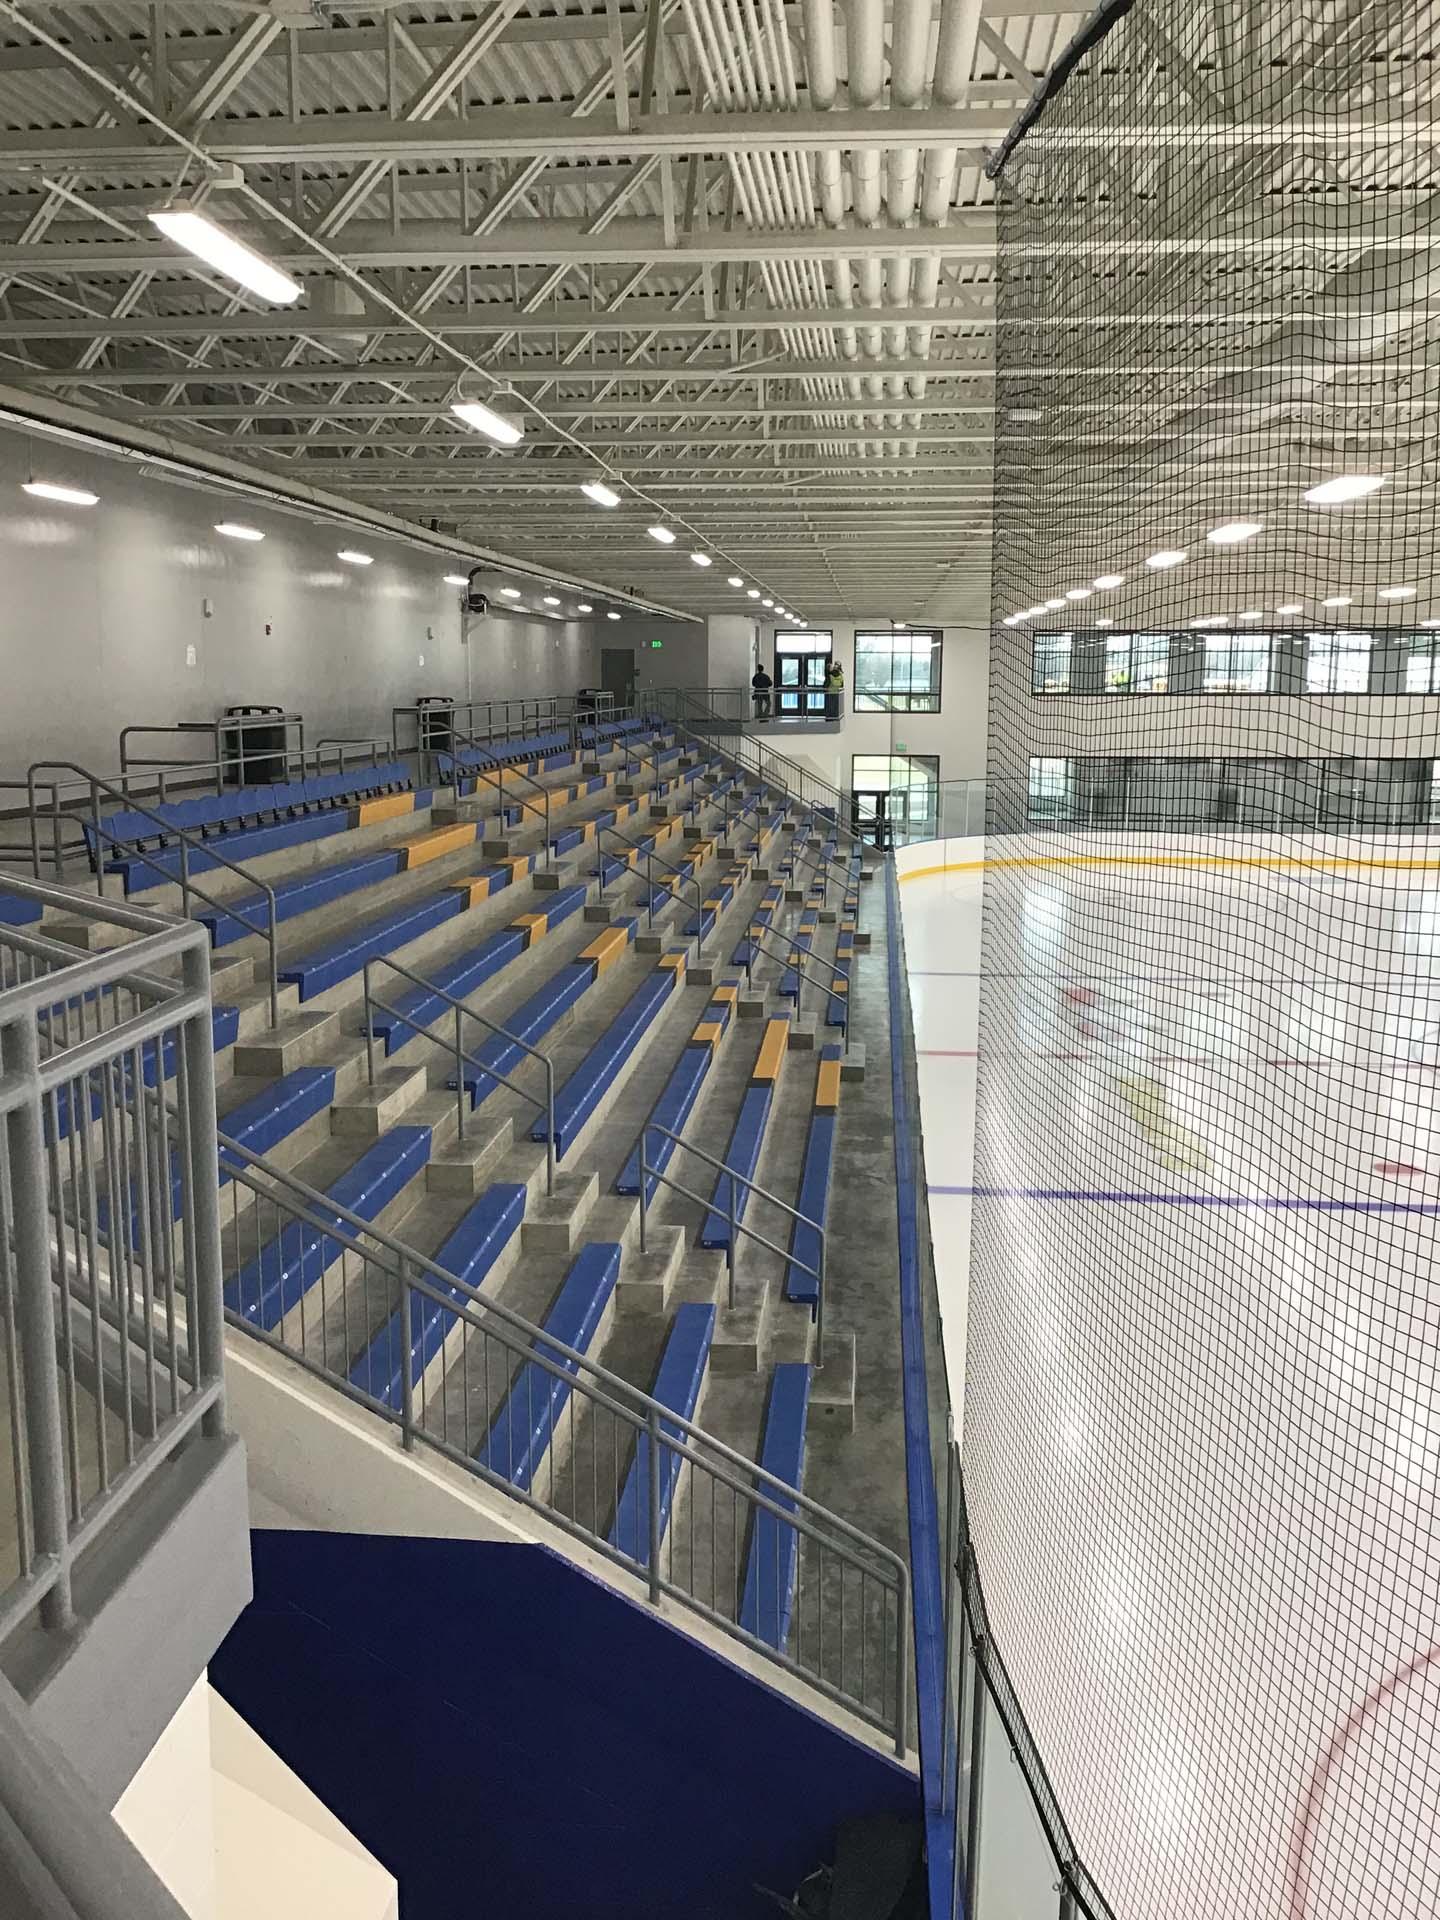 St Michael Albertville Ice Arena